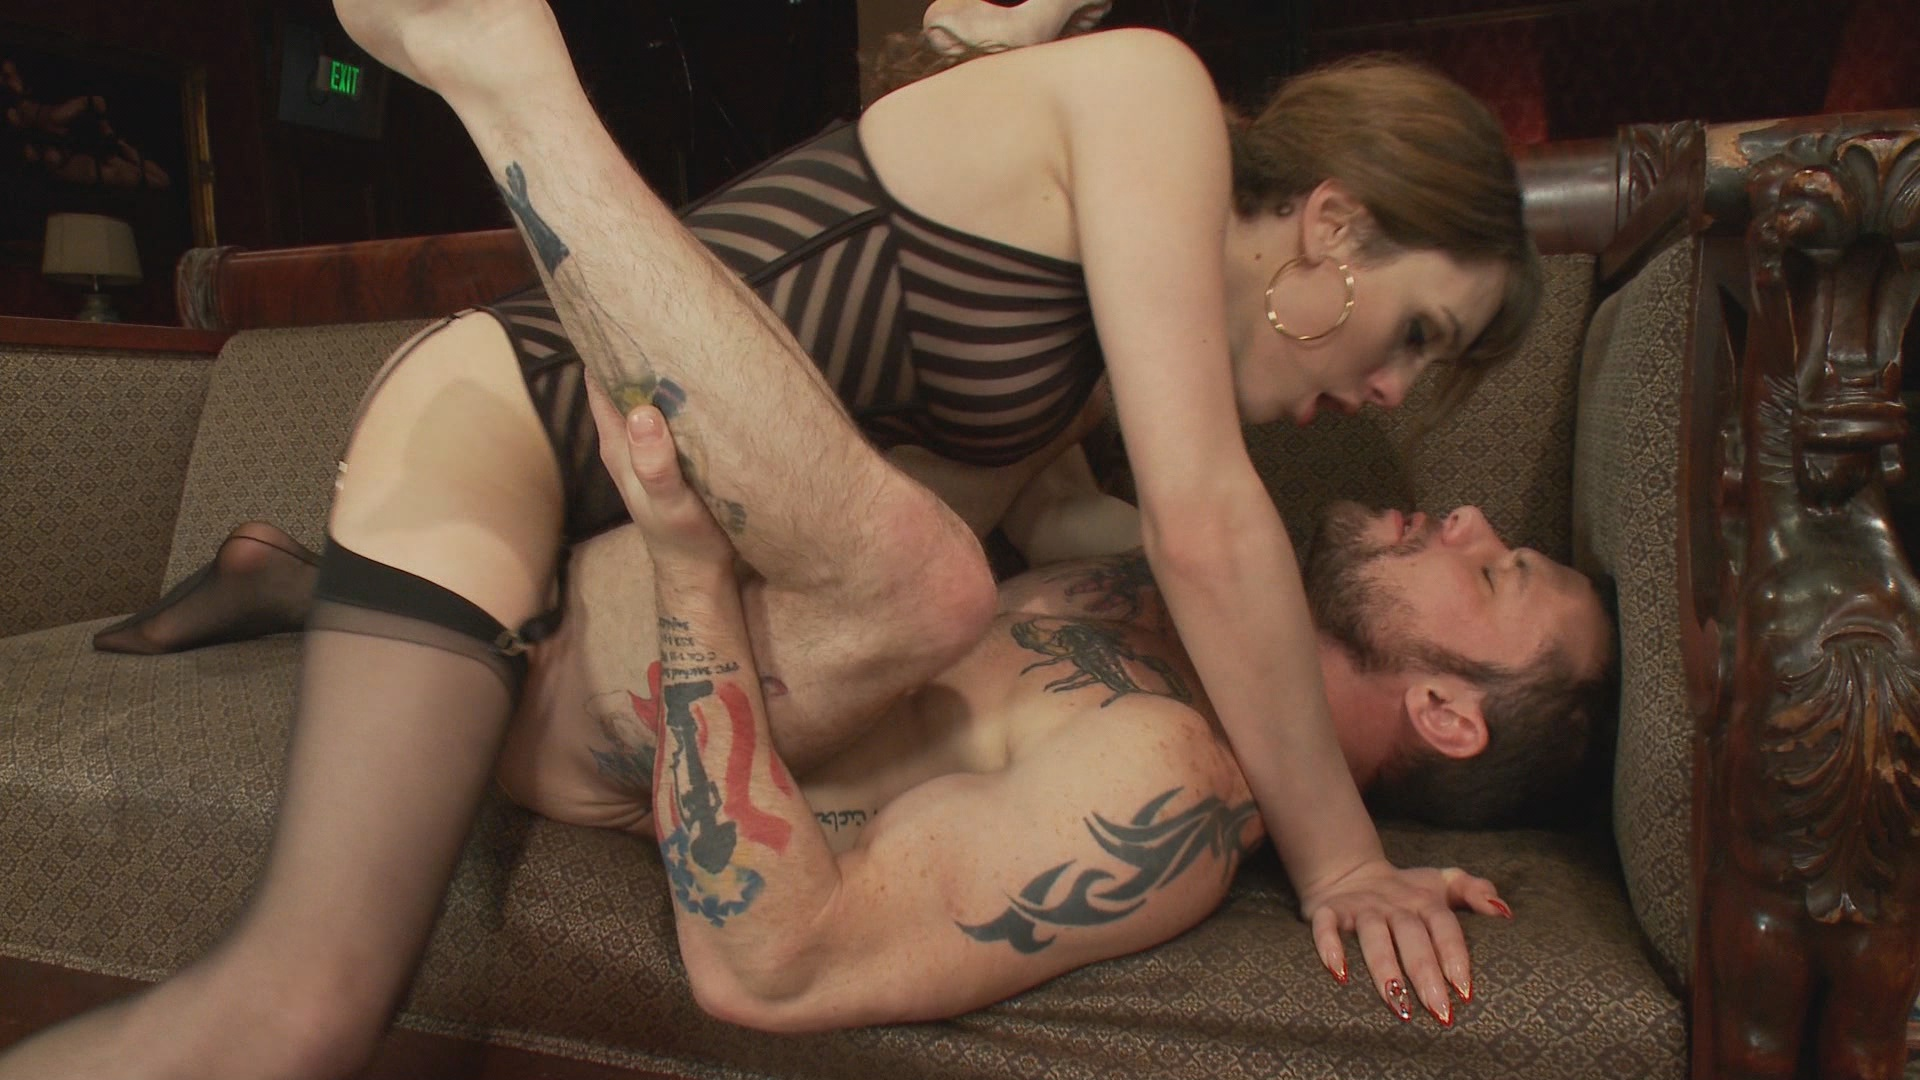 TS Seduction: Swinger Party Seduction xvideos202705